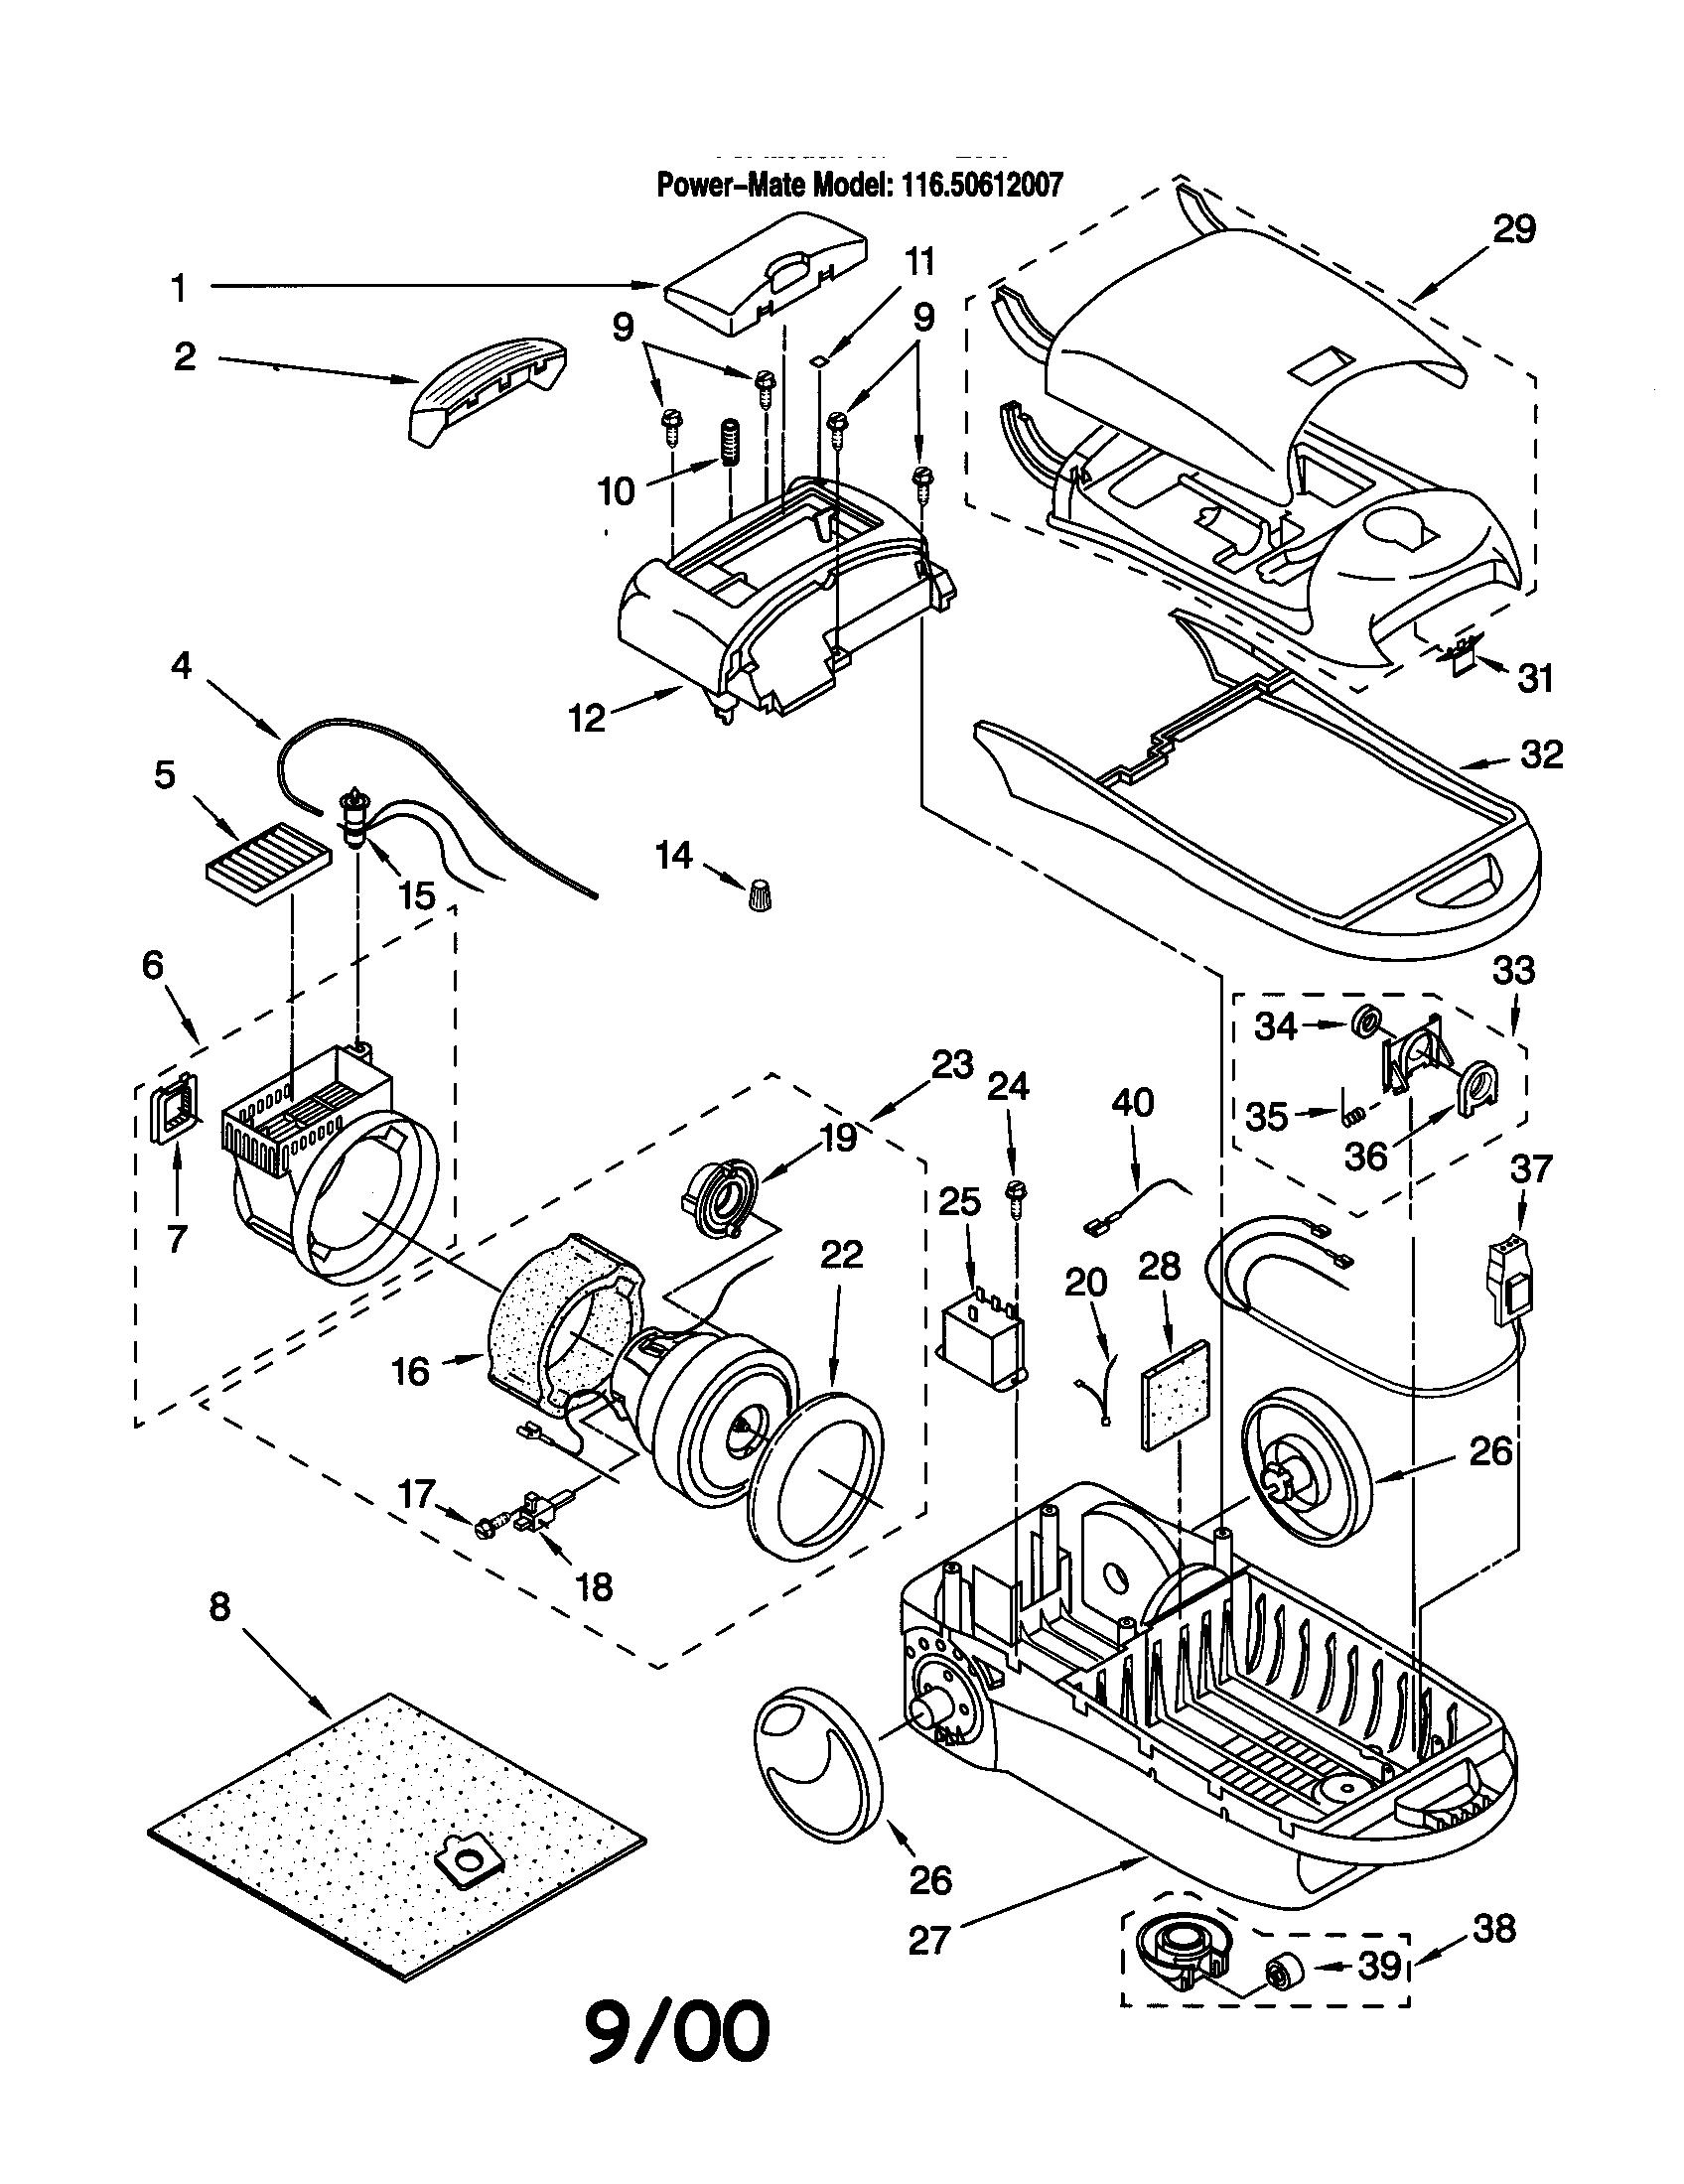 Vacuum Cleaner Parts Buscar Con Google Giclee Art Print Art Prints Giclee Art